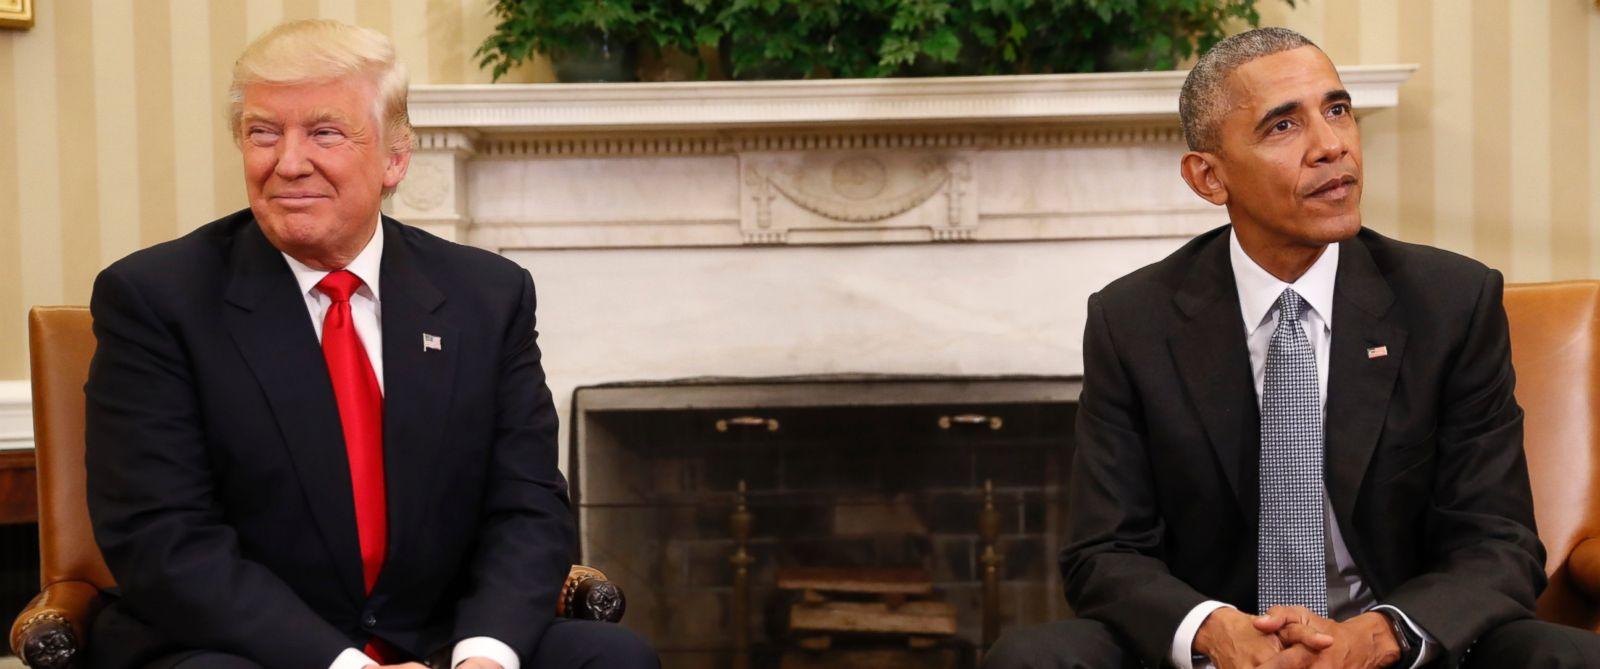 trump-obama-oval-office